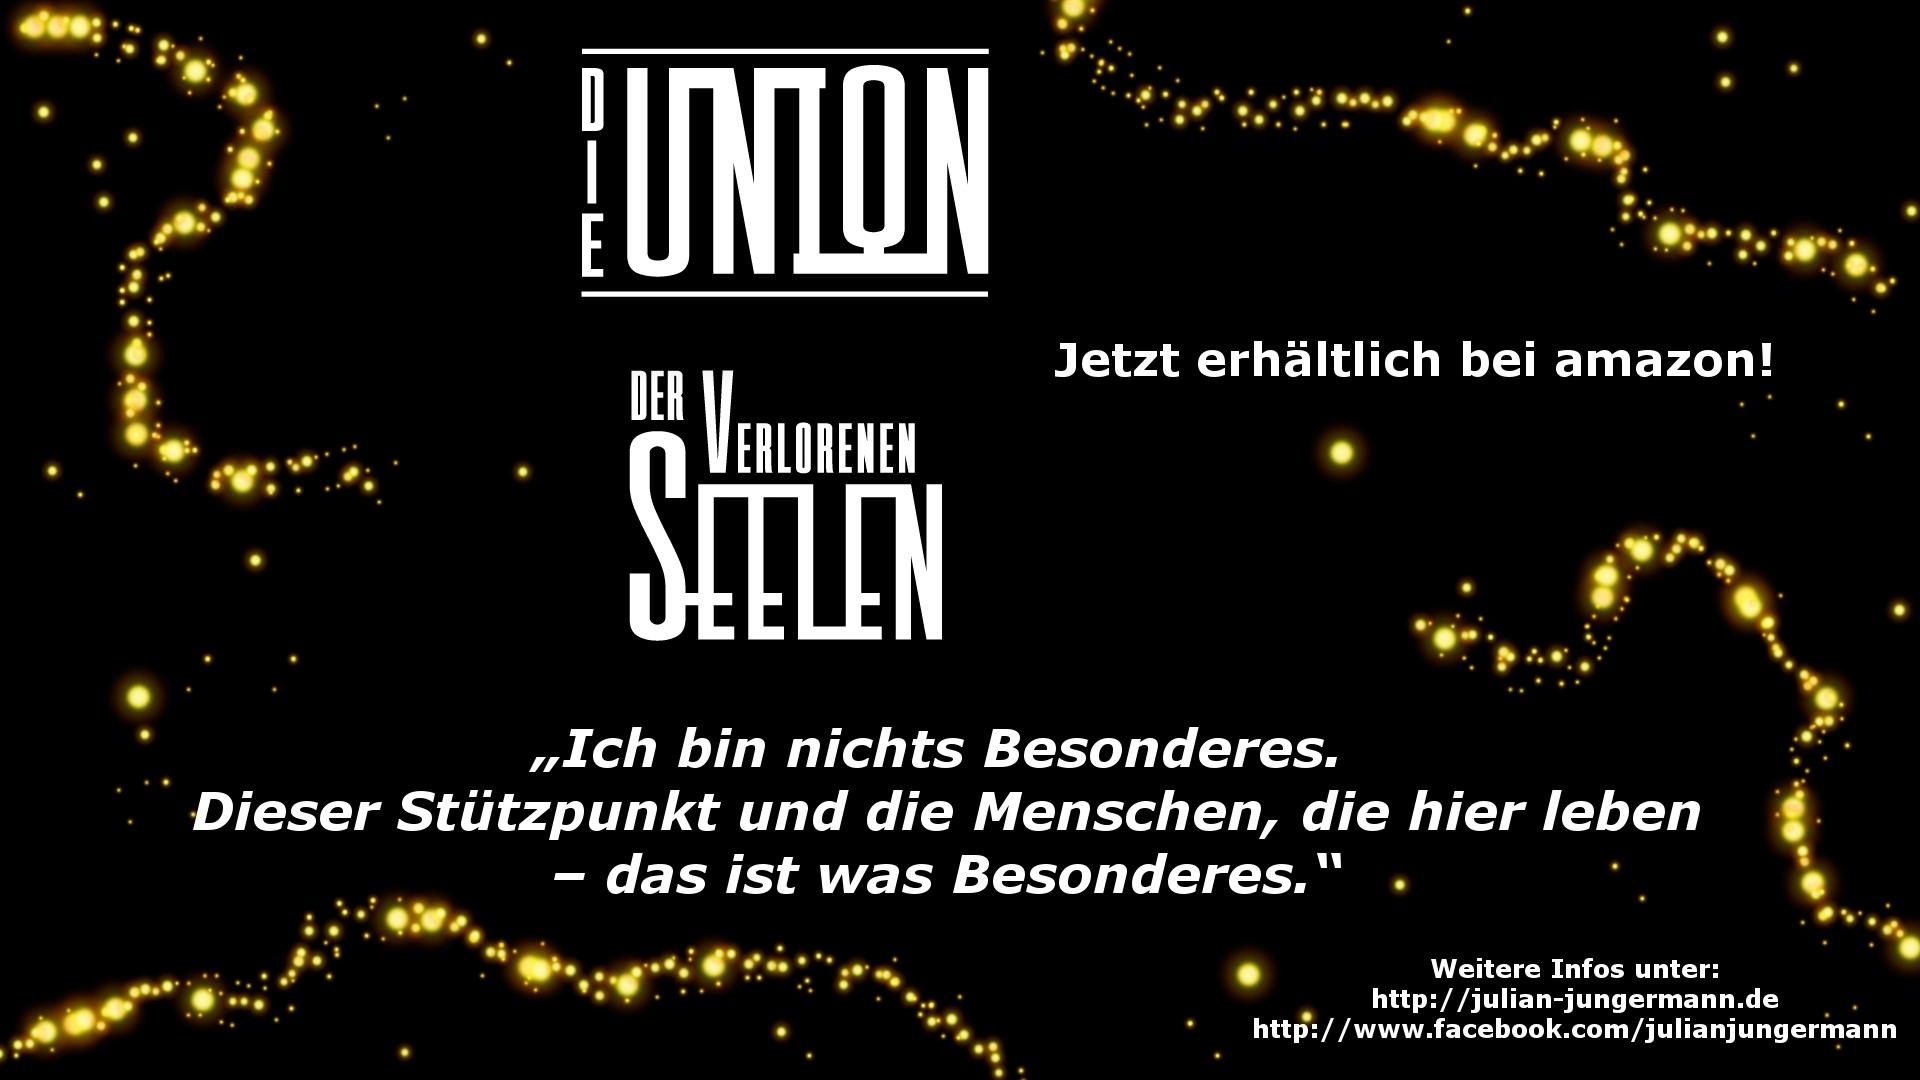 Debutroman der Union-Trilogie: Release bei Amazon